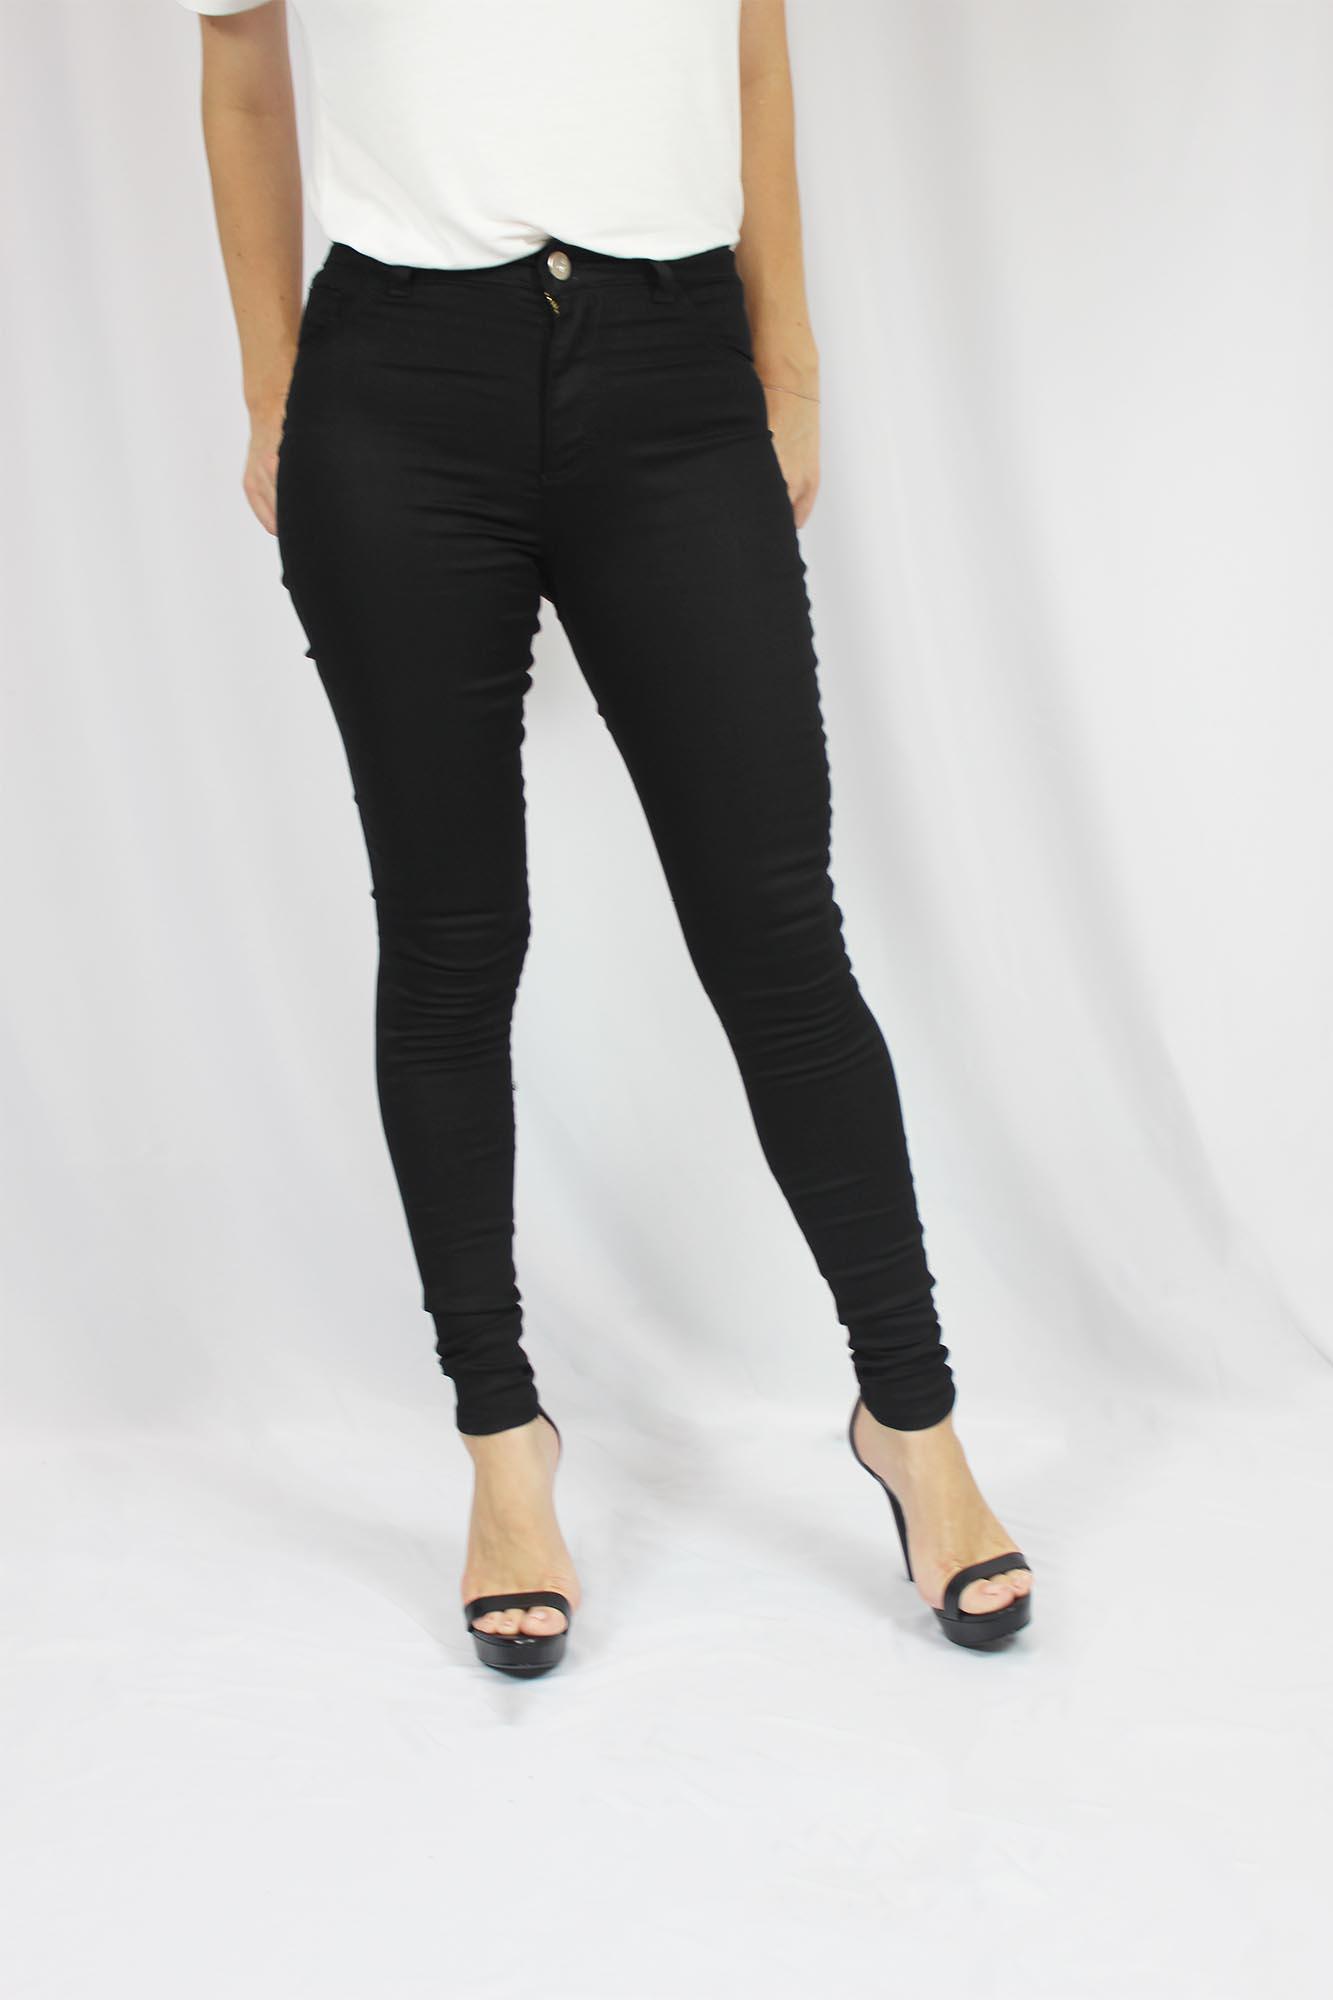 Calça Jeans Feminina - Preta